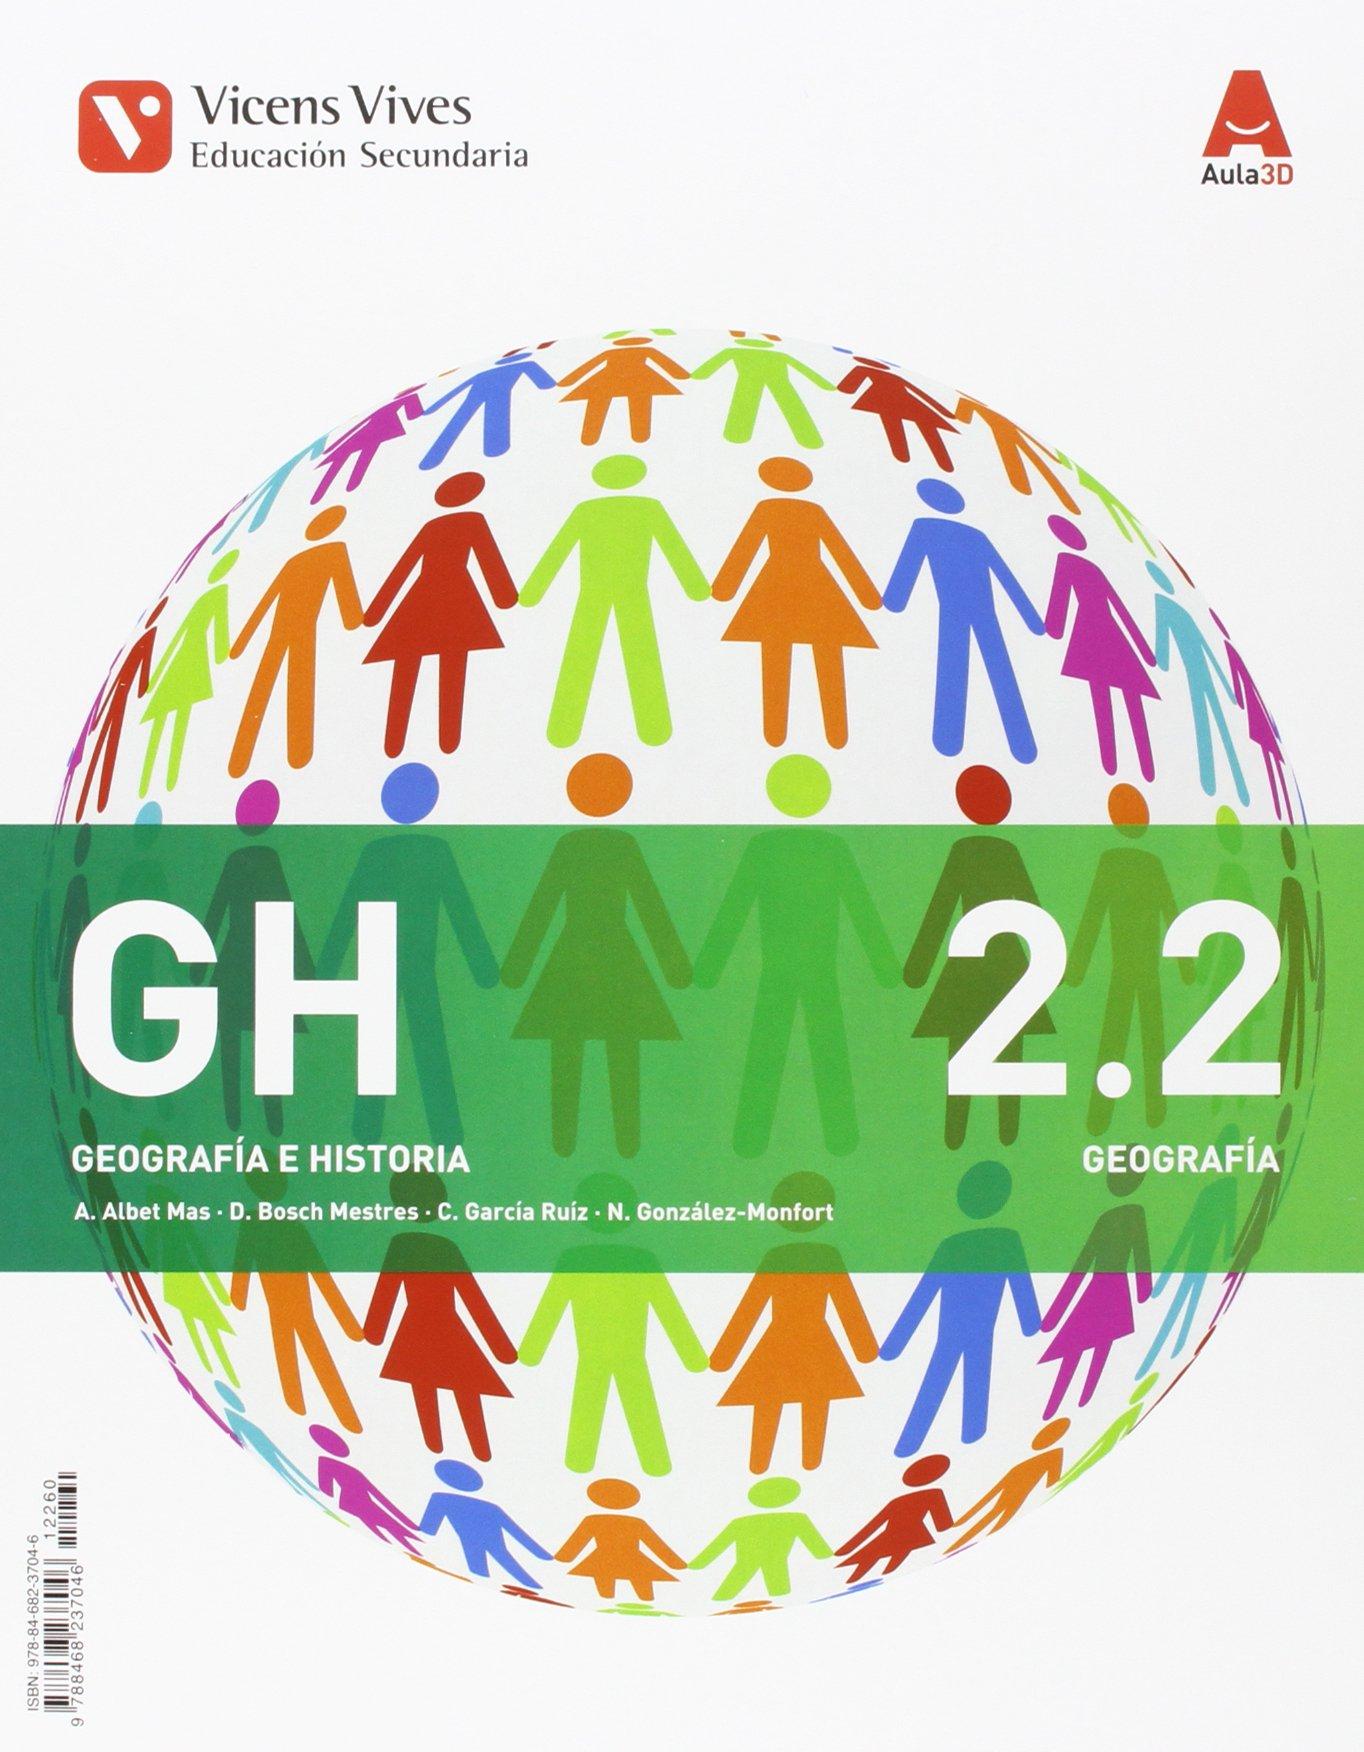 GH 2 MADRID HIST/GEO + SEP GEO AULA 3D: GH 2 COMUNIDAD DE MADRID HIST/GEO + SEP GEO AULA 3D: Amazon.es: Albet Mas, Abel, Bosch Mestres, Dolors, Garcia Ruiz, Carles, Gonzalez Monfort,